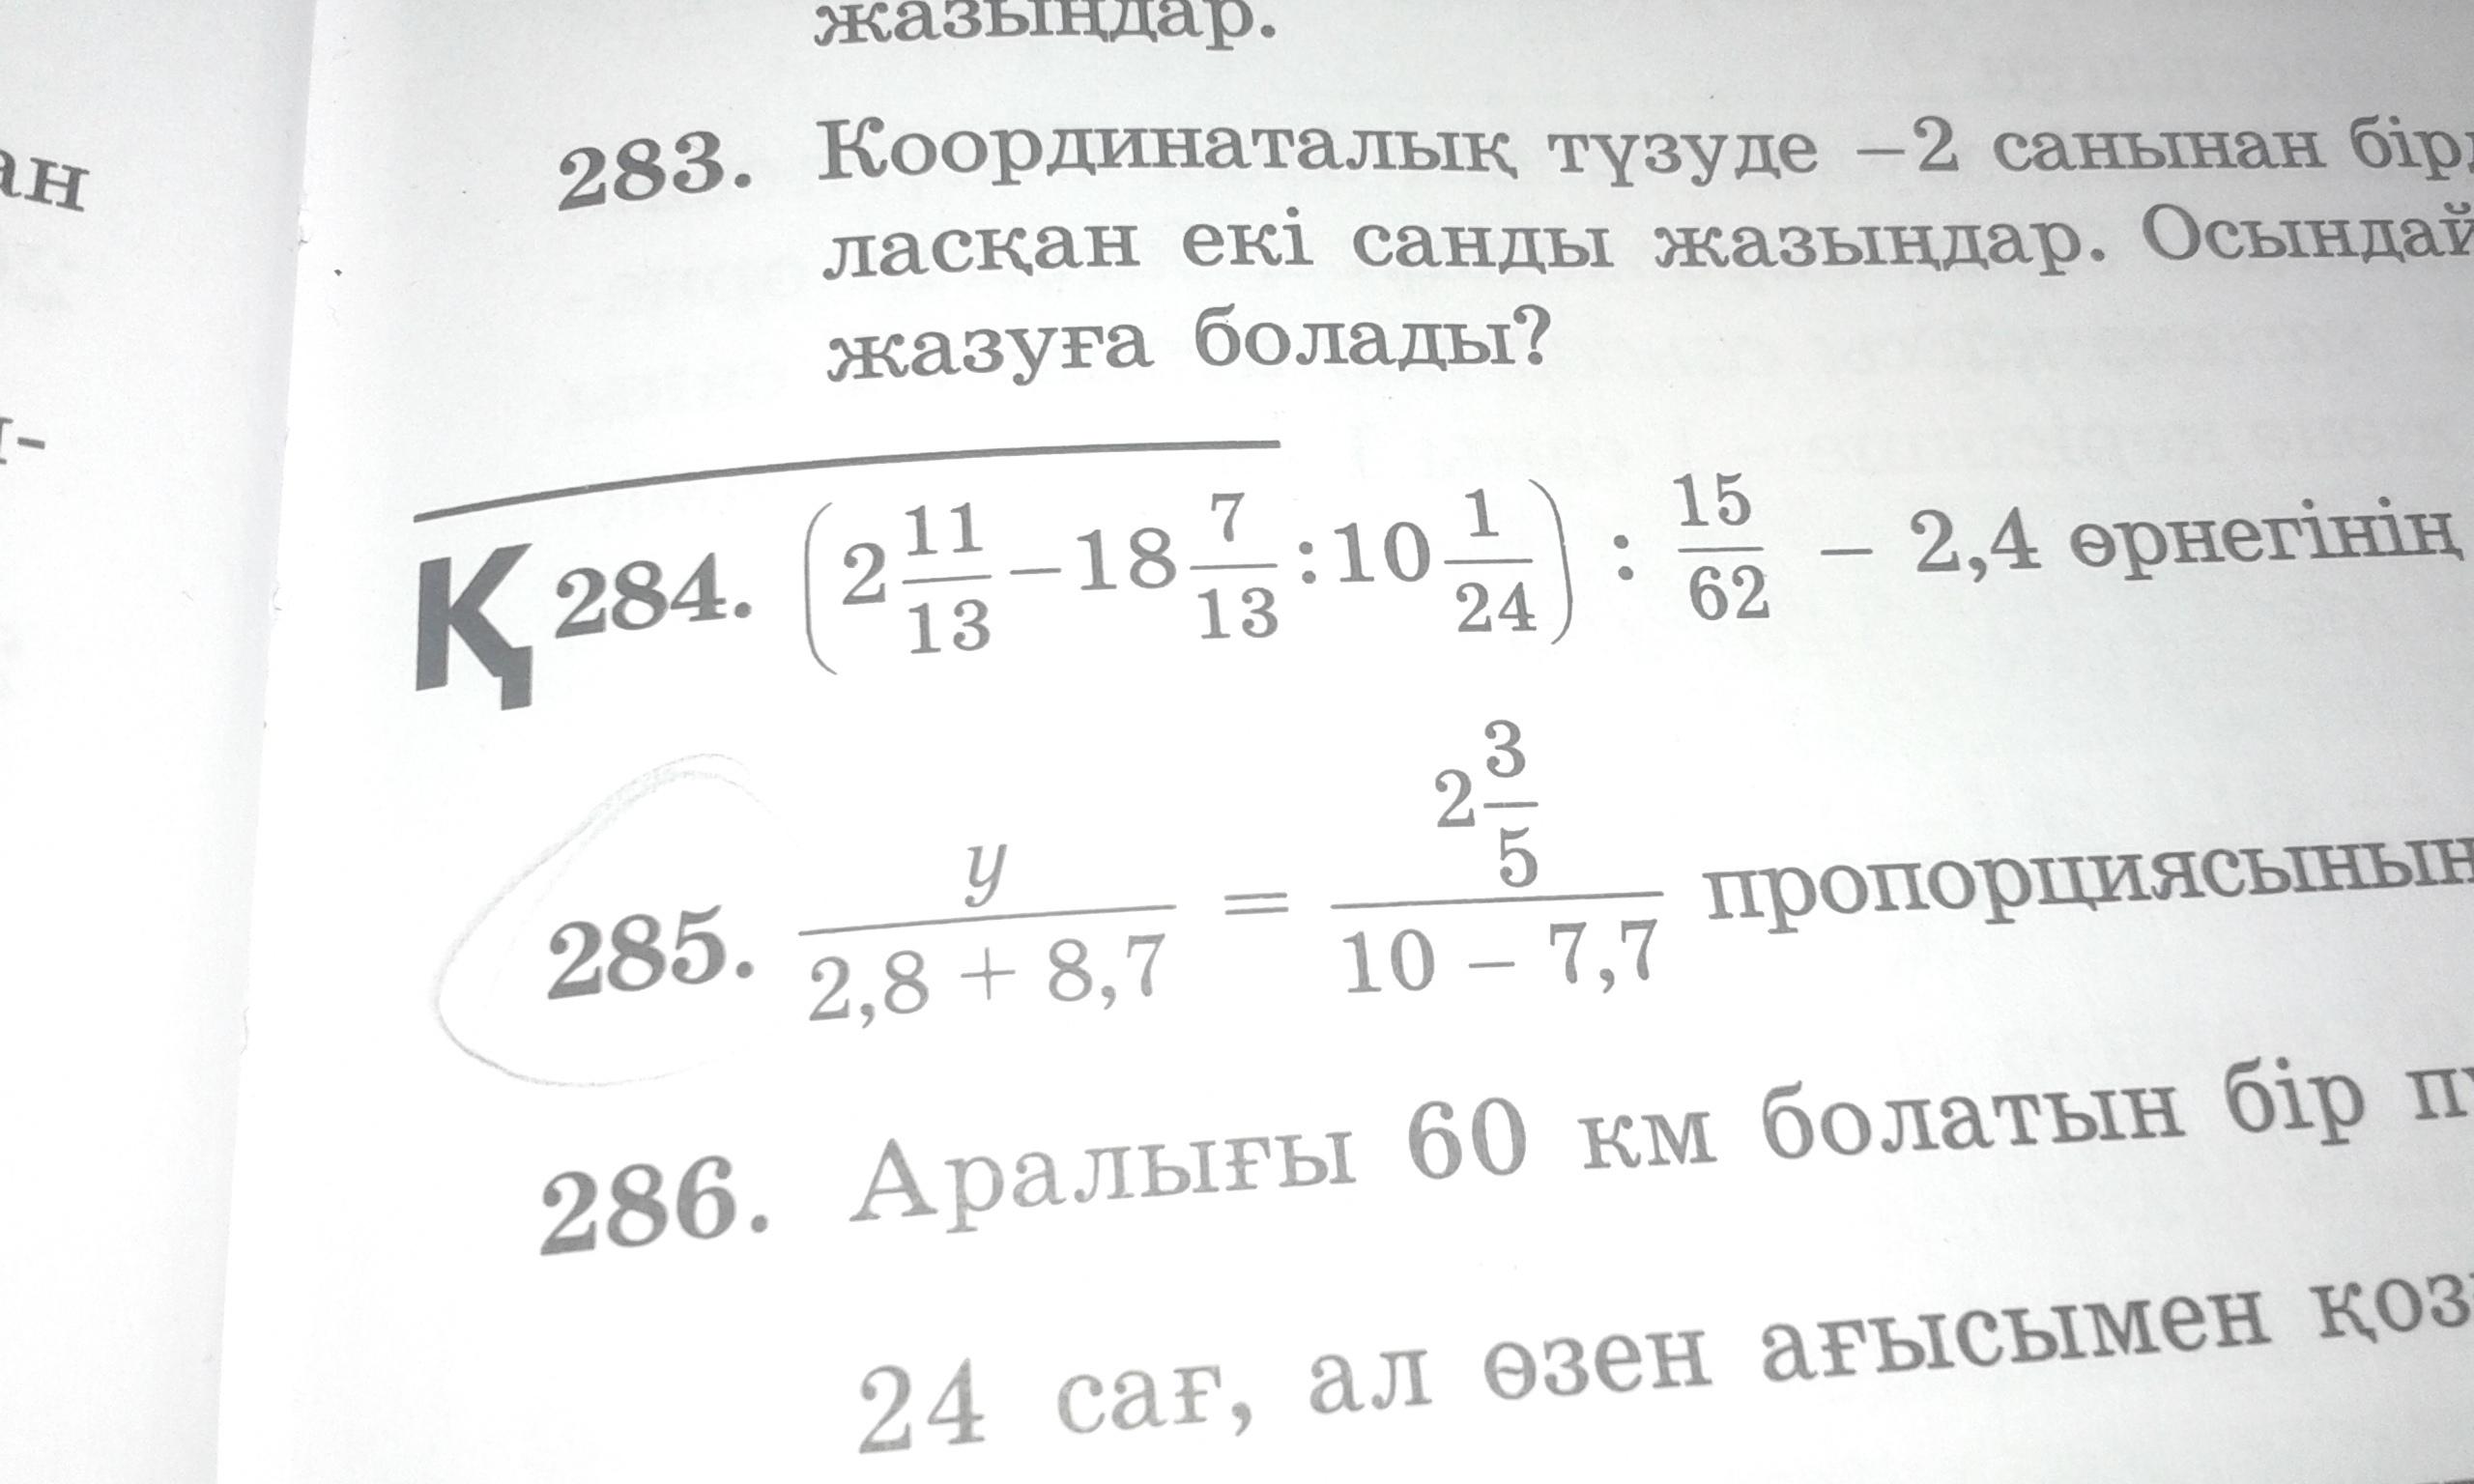 Помогите!!!!!!!!!!!!! Плиз!!! )))))С номером 285